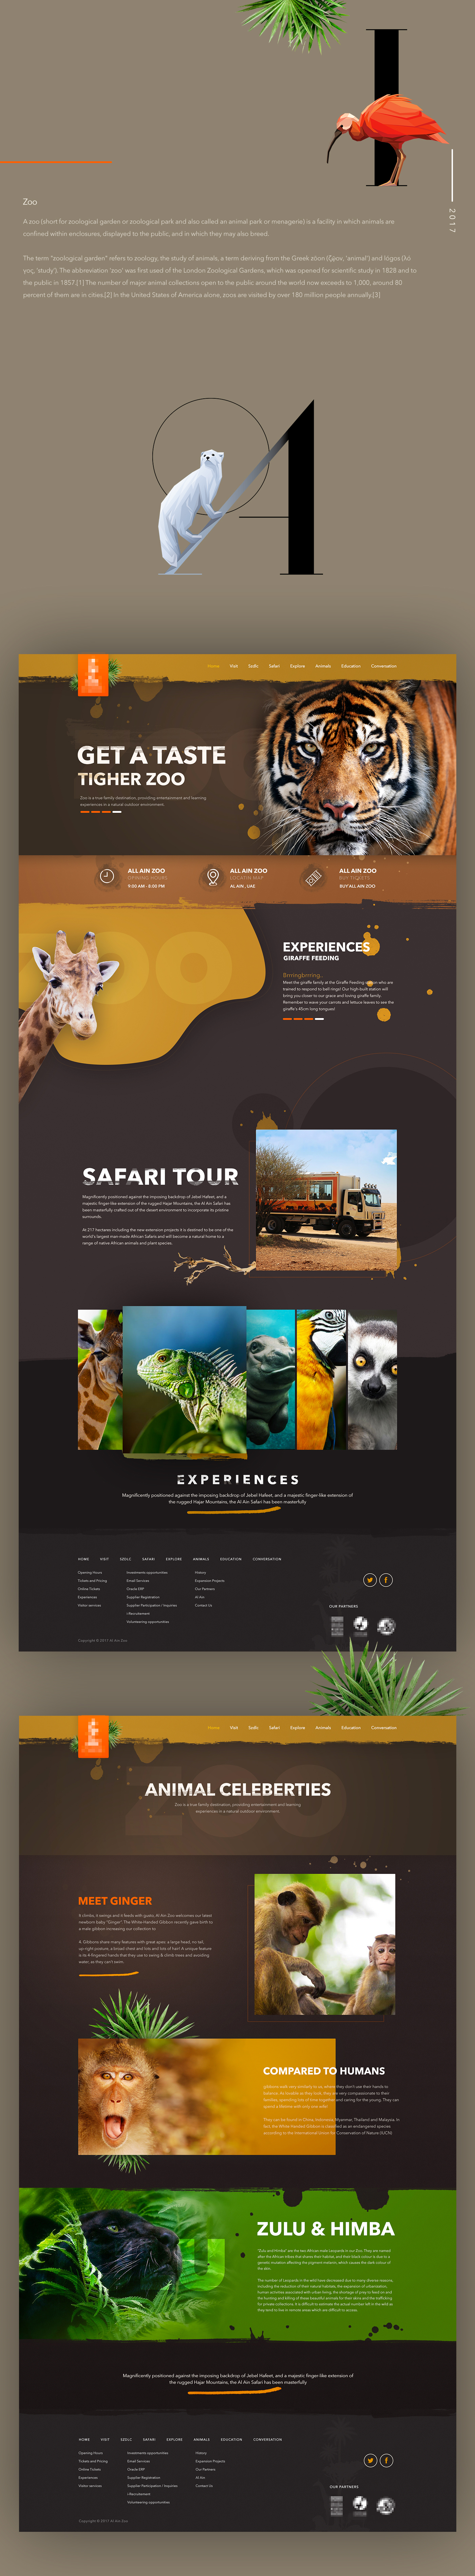 Web desing zoo animal Responsive logo color